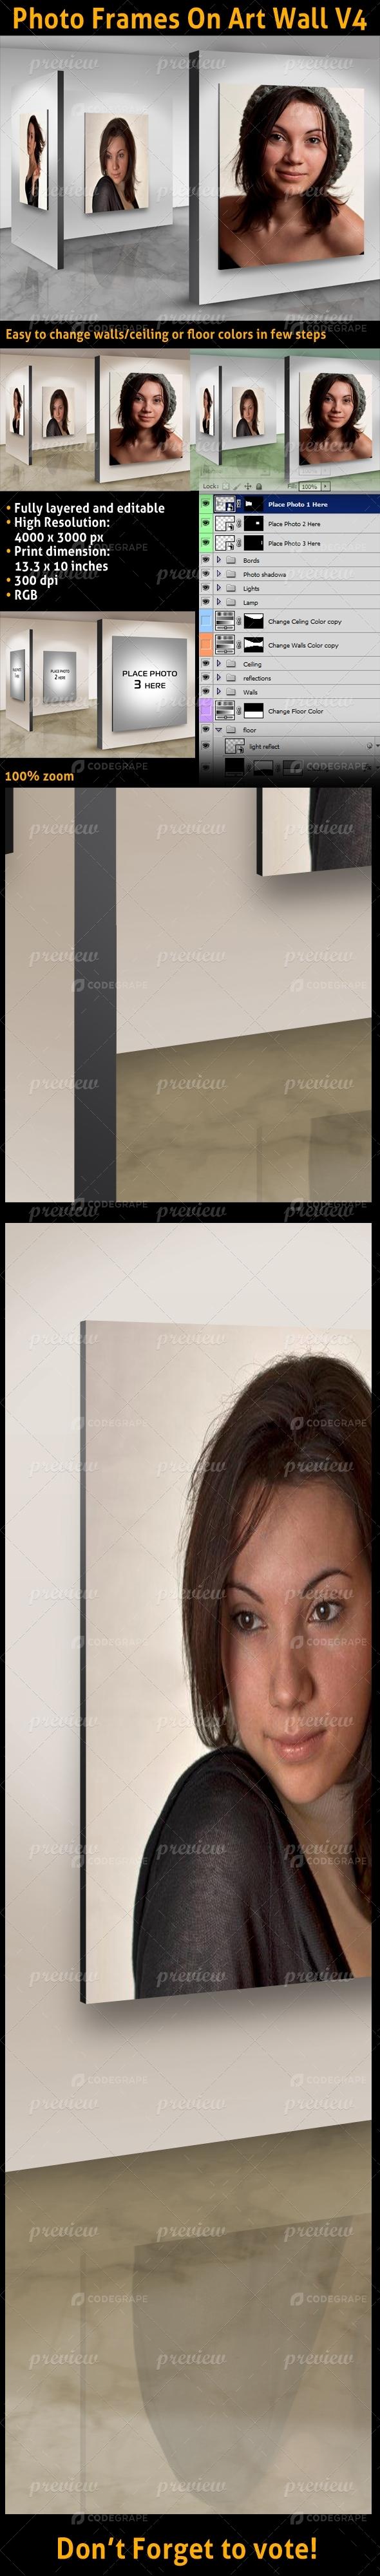 Photo Frames On Art Wall V4